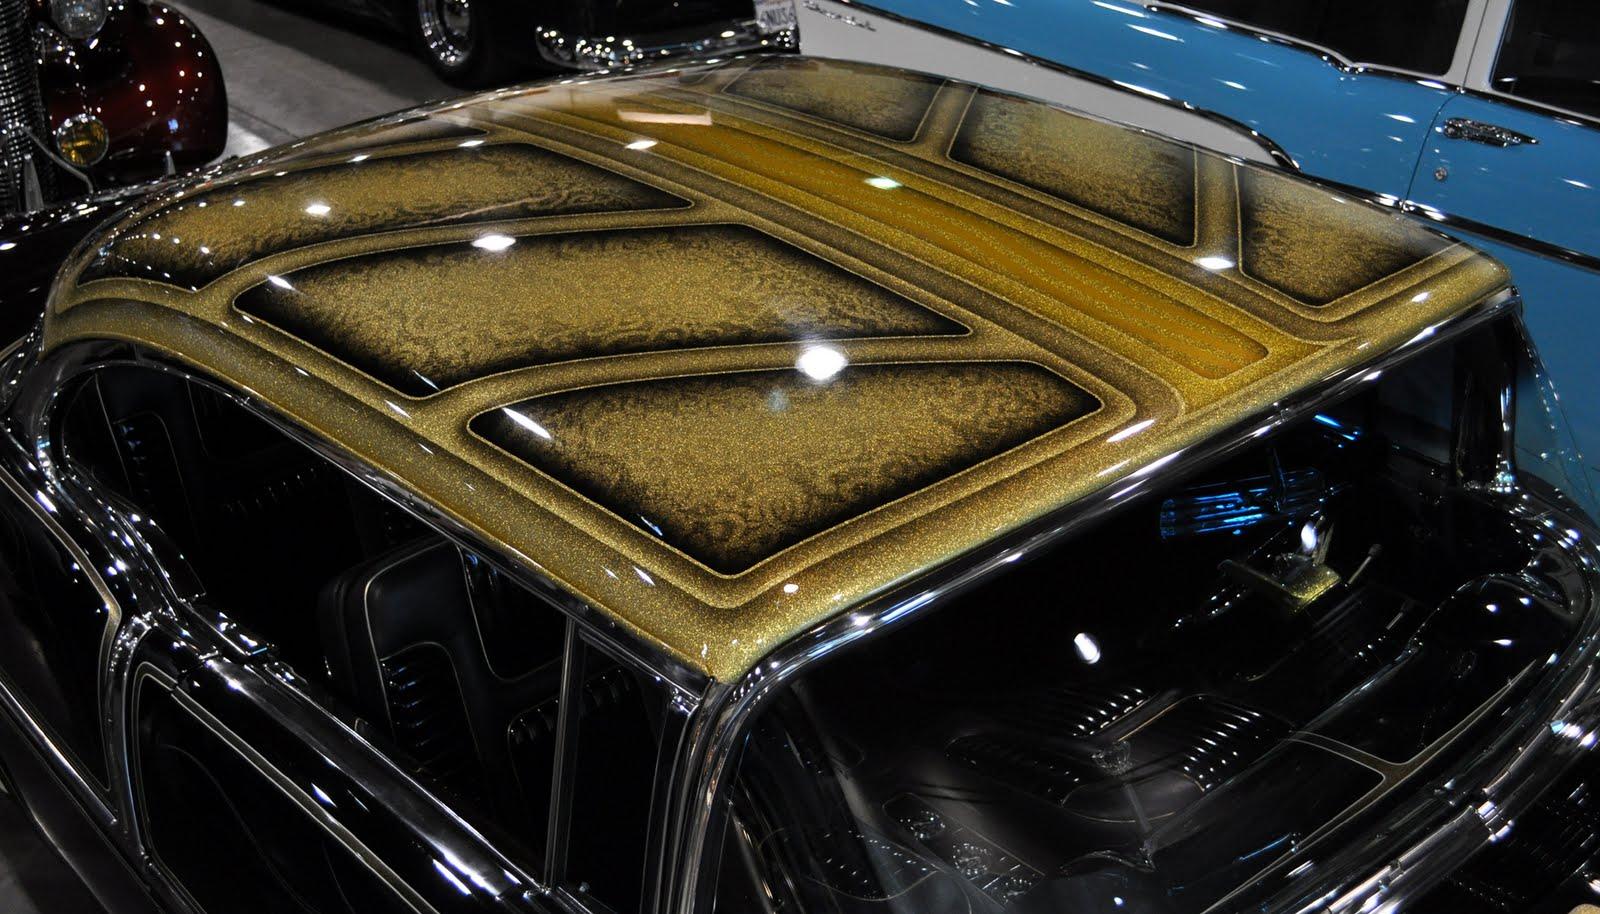 just a car guy austin speed shop 39 s el gringo loco fantastic interior superb lace paint. Black Bedroom Furniture Sets. Home Design Ideas